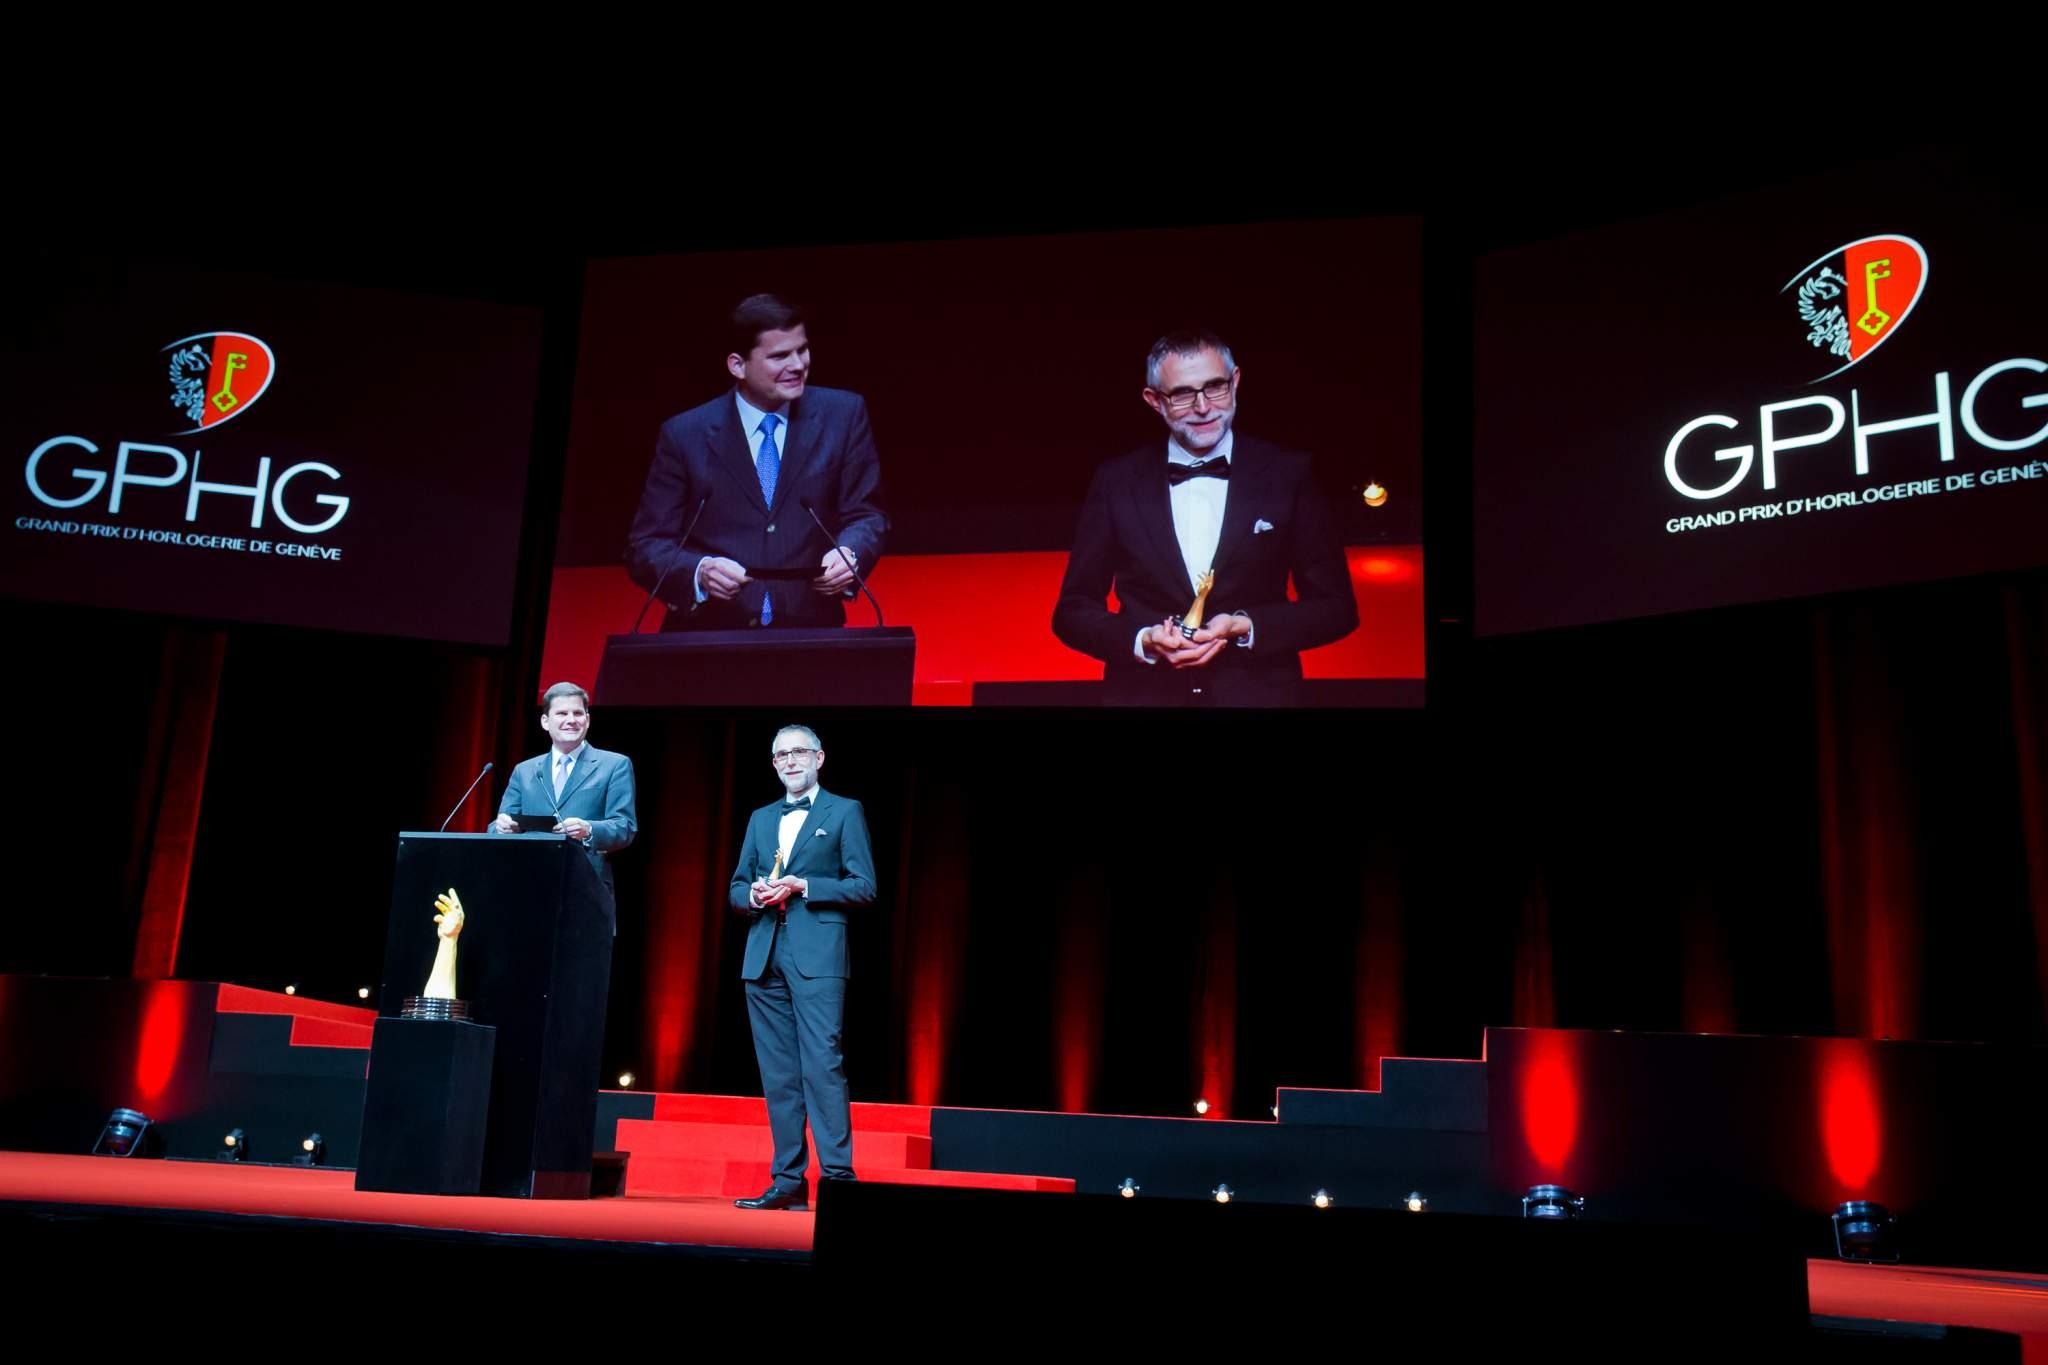 Patrick Wehrli and Alexey Tarkhanov, members of the Jury 2013